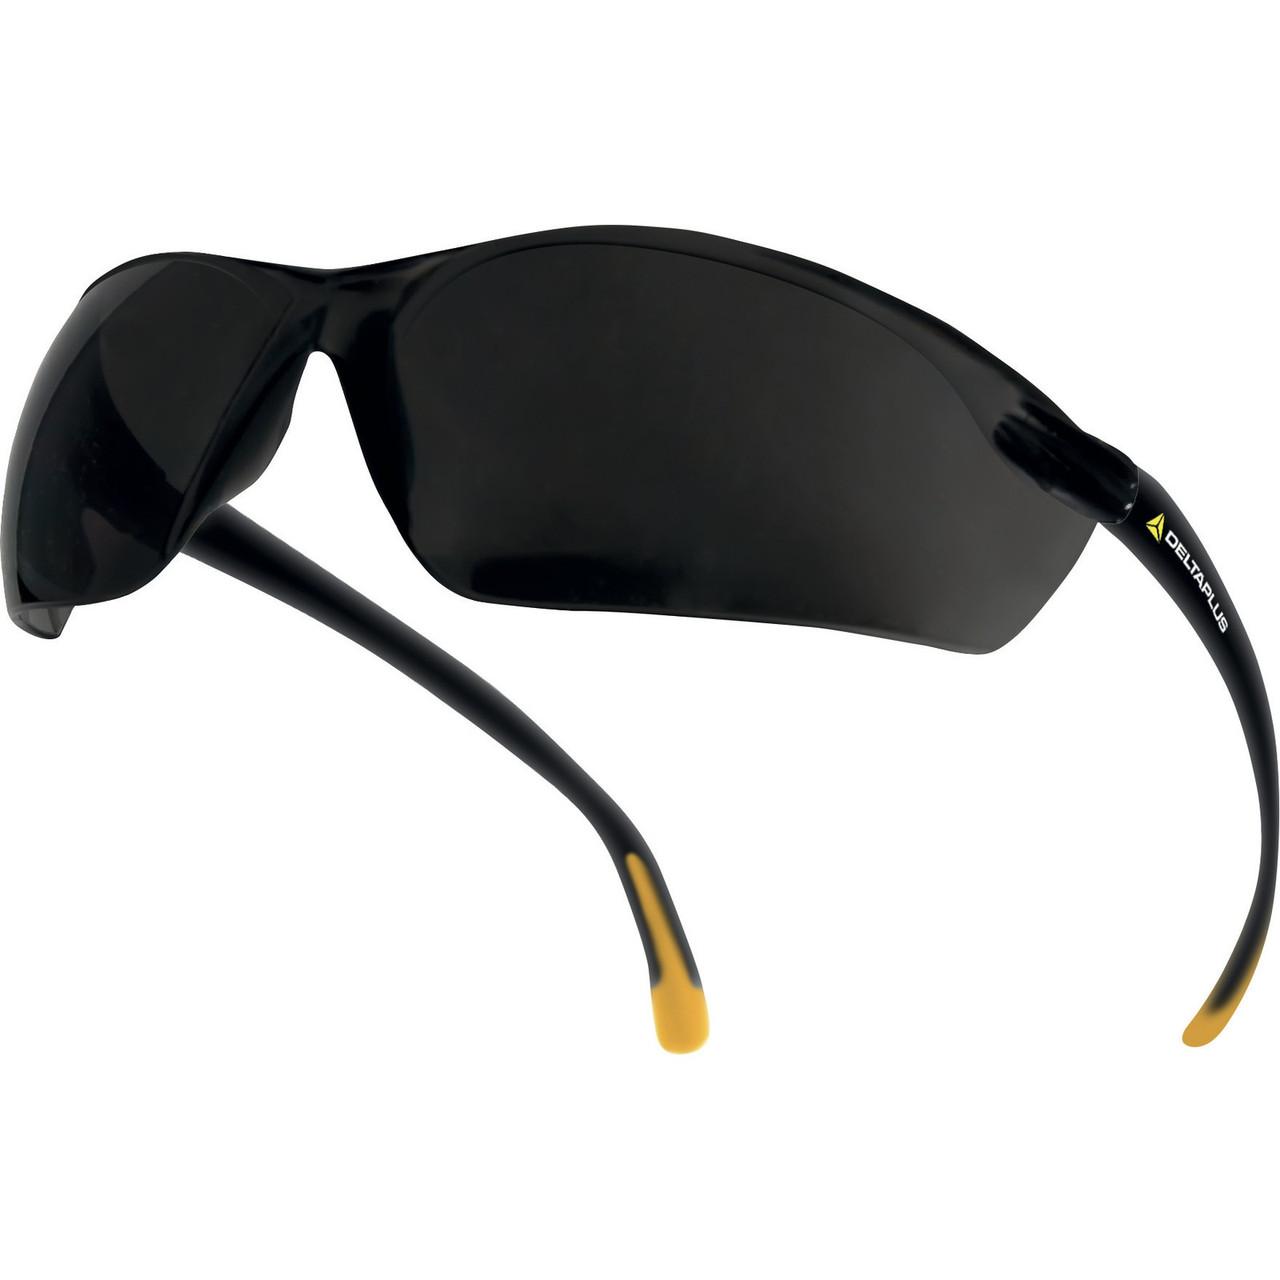 Захист органів зору Окуляри ESSENTIAL MEIA SMOKE